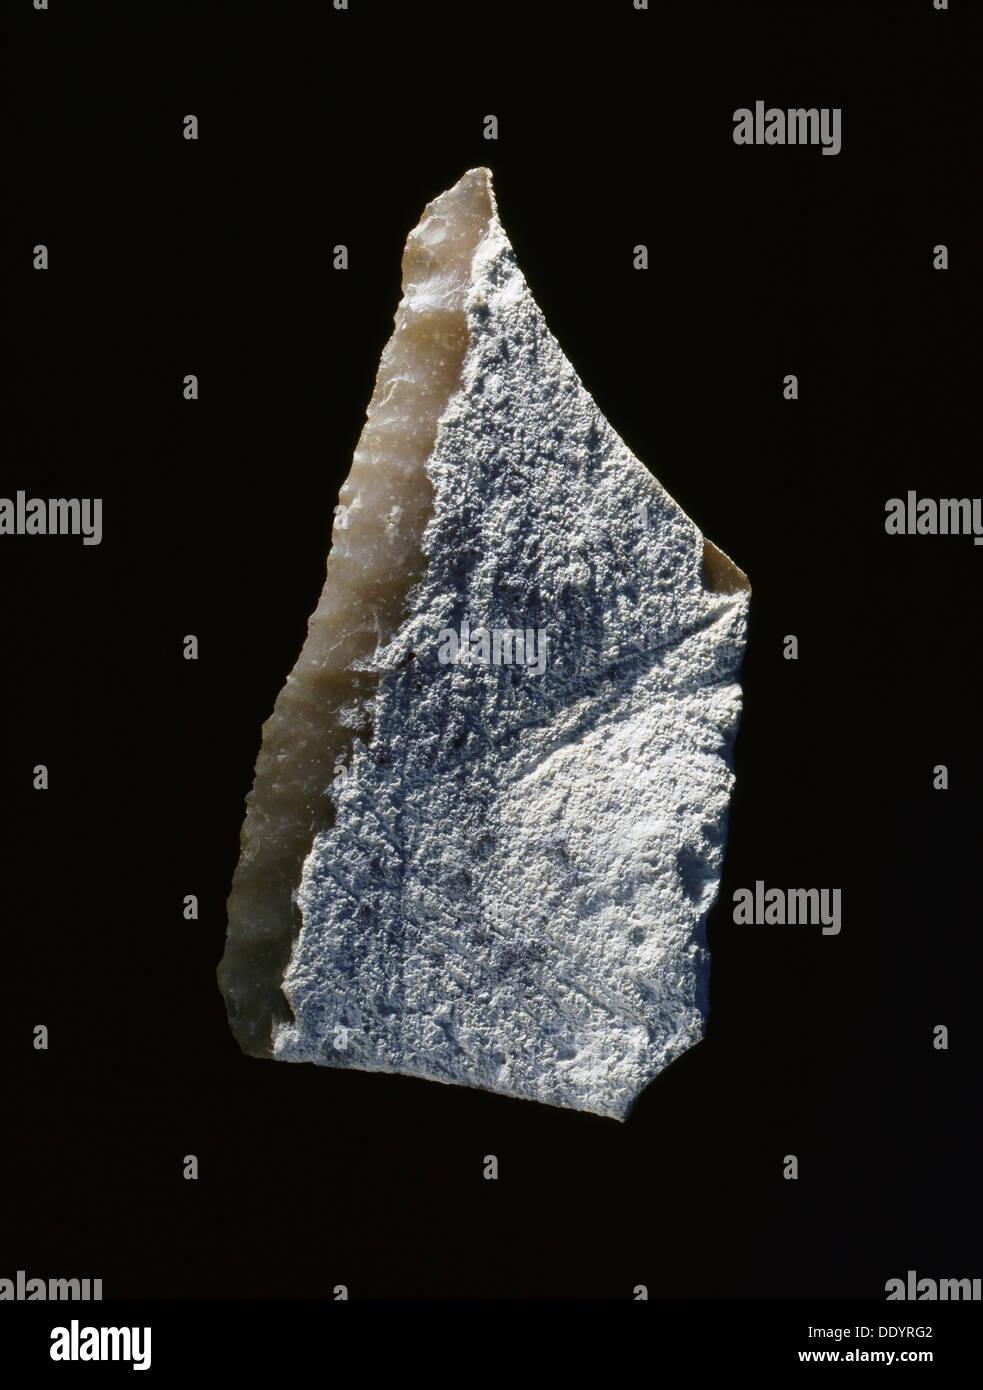 Neolithic stone scraper, from Habshan, Abu Dhabi, United Arab Emirates, c5000 BC.  Artist: Werner Forman - Stock Image